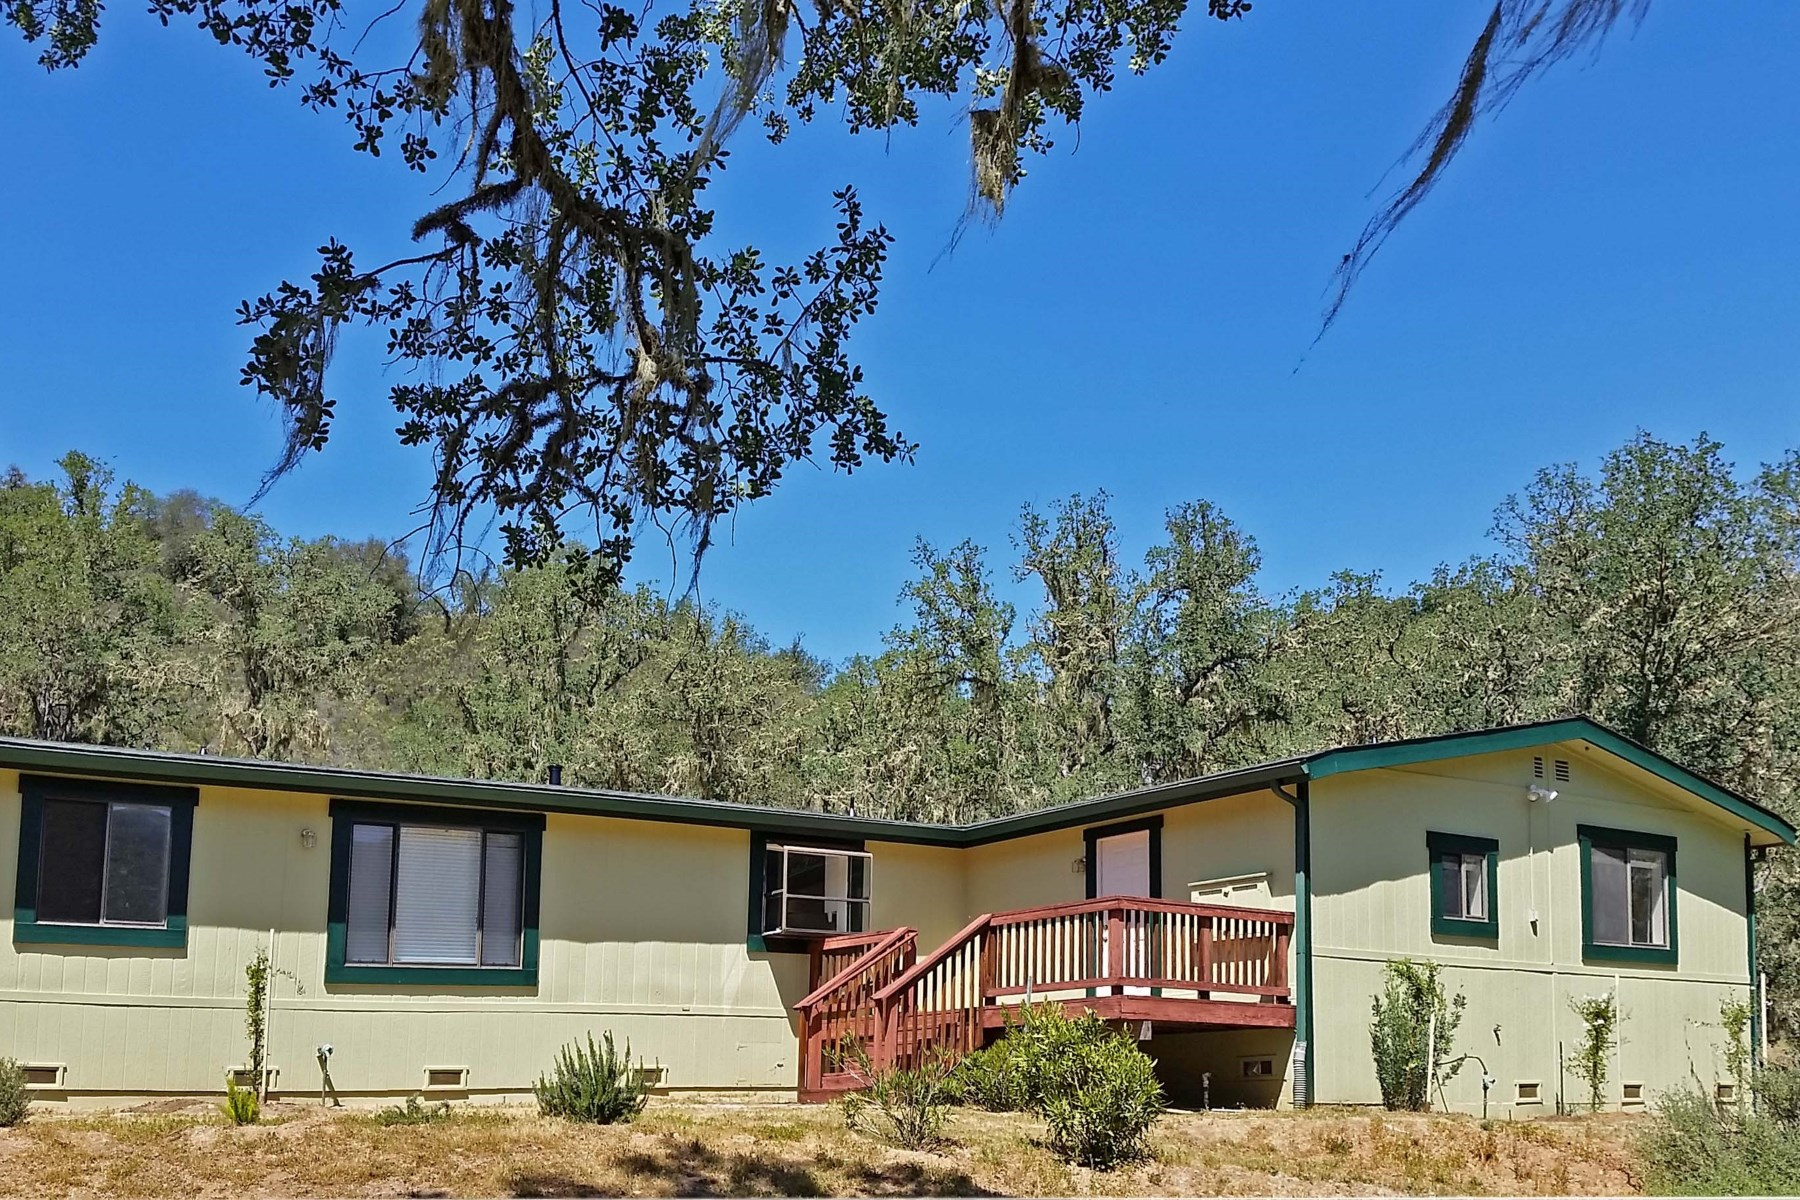 Moradia Multi-familiar para Venda às A Sweet Carmel Valley Retreat 3 Trampa Canyon Carmel Valley, Califórnia 93924 Estados Unidos